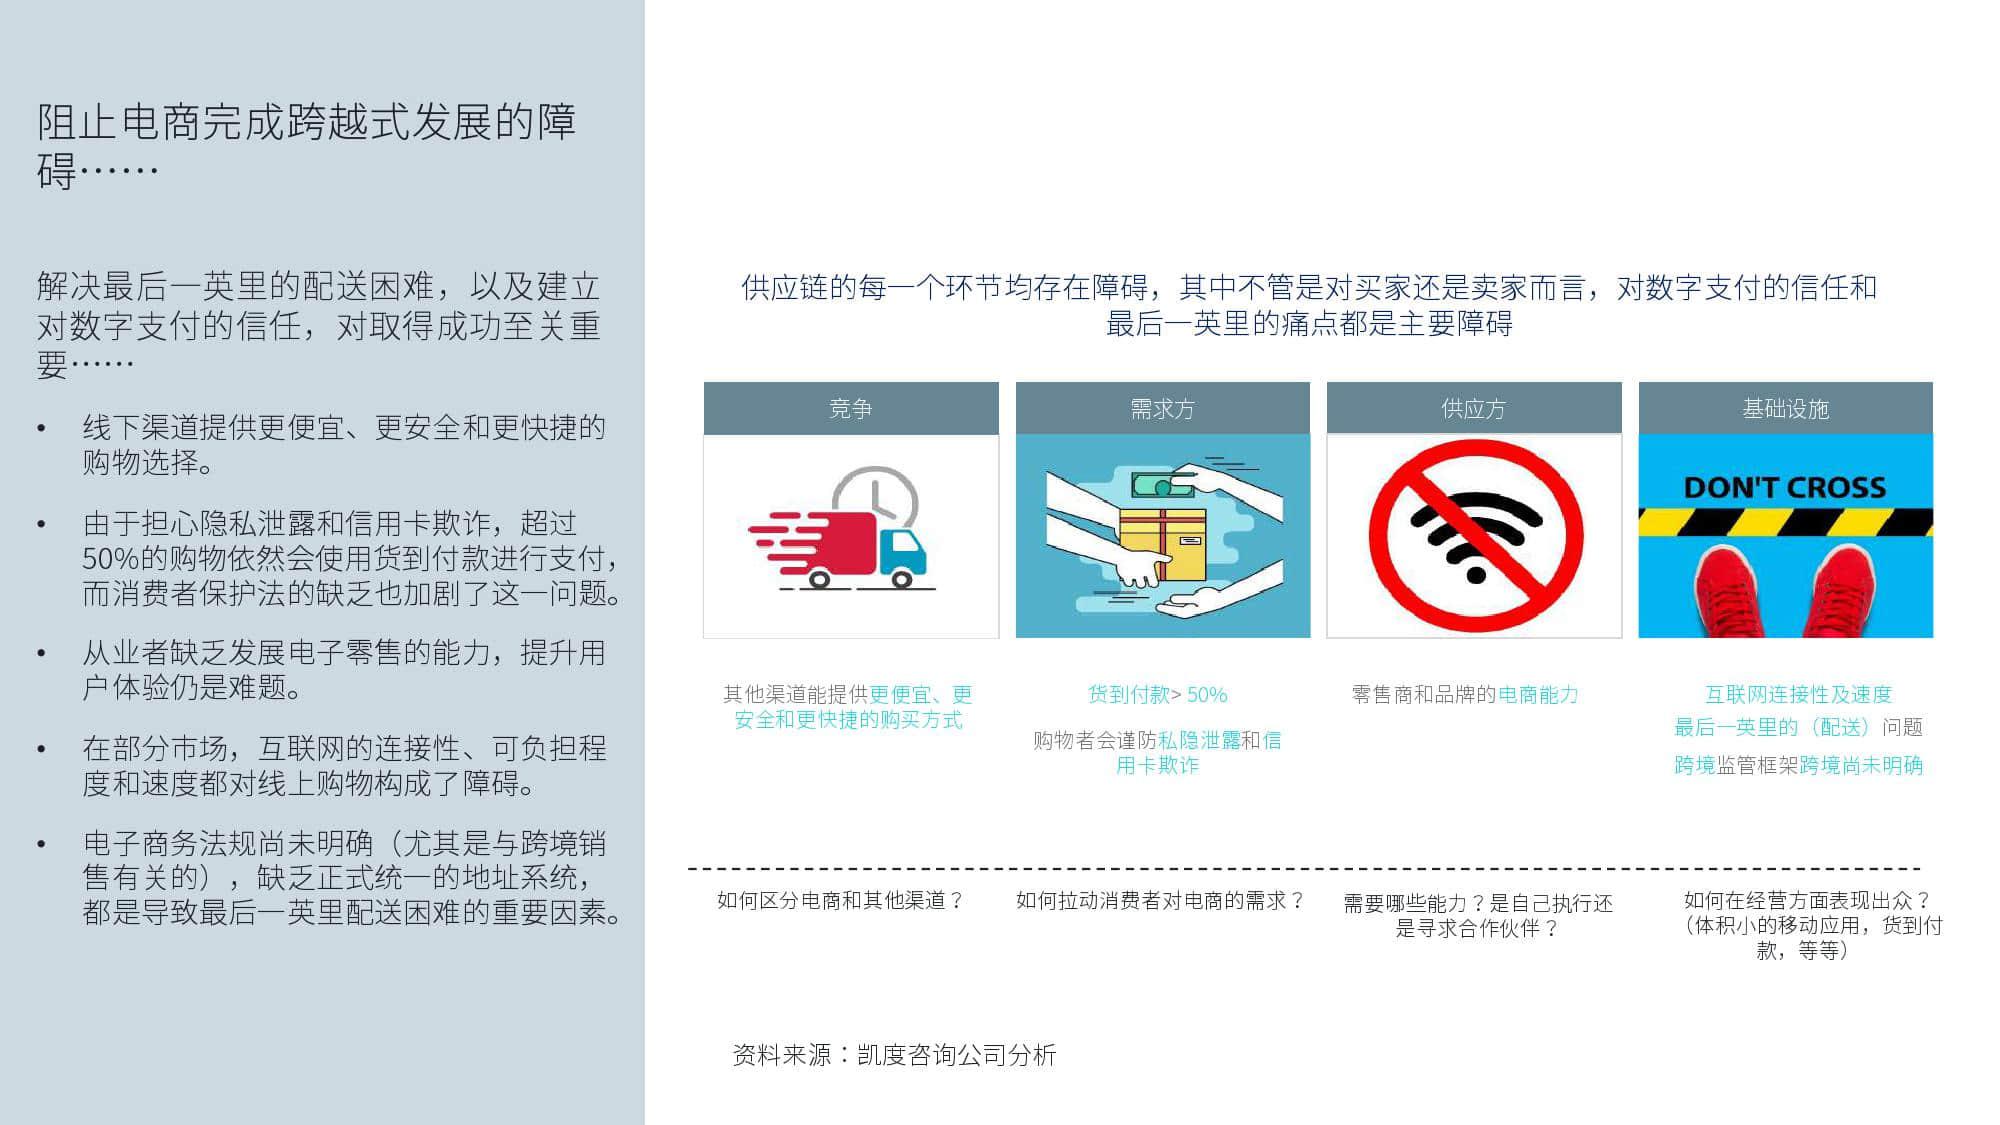 KantarFaceoobk:中东跨境电商市场白皮书